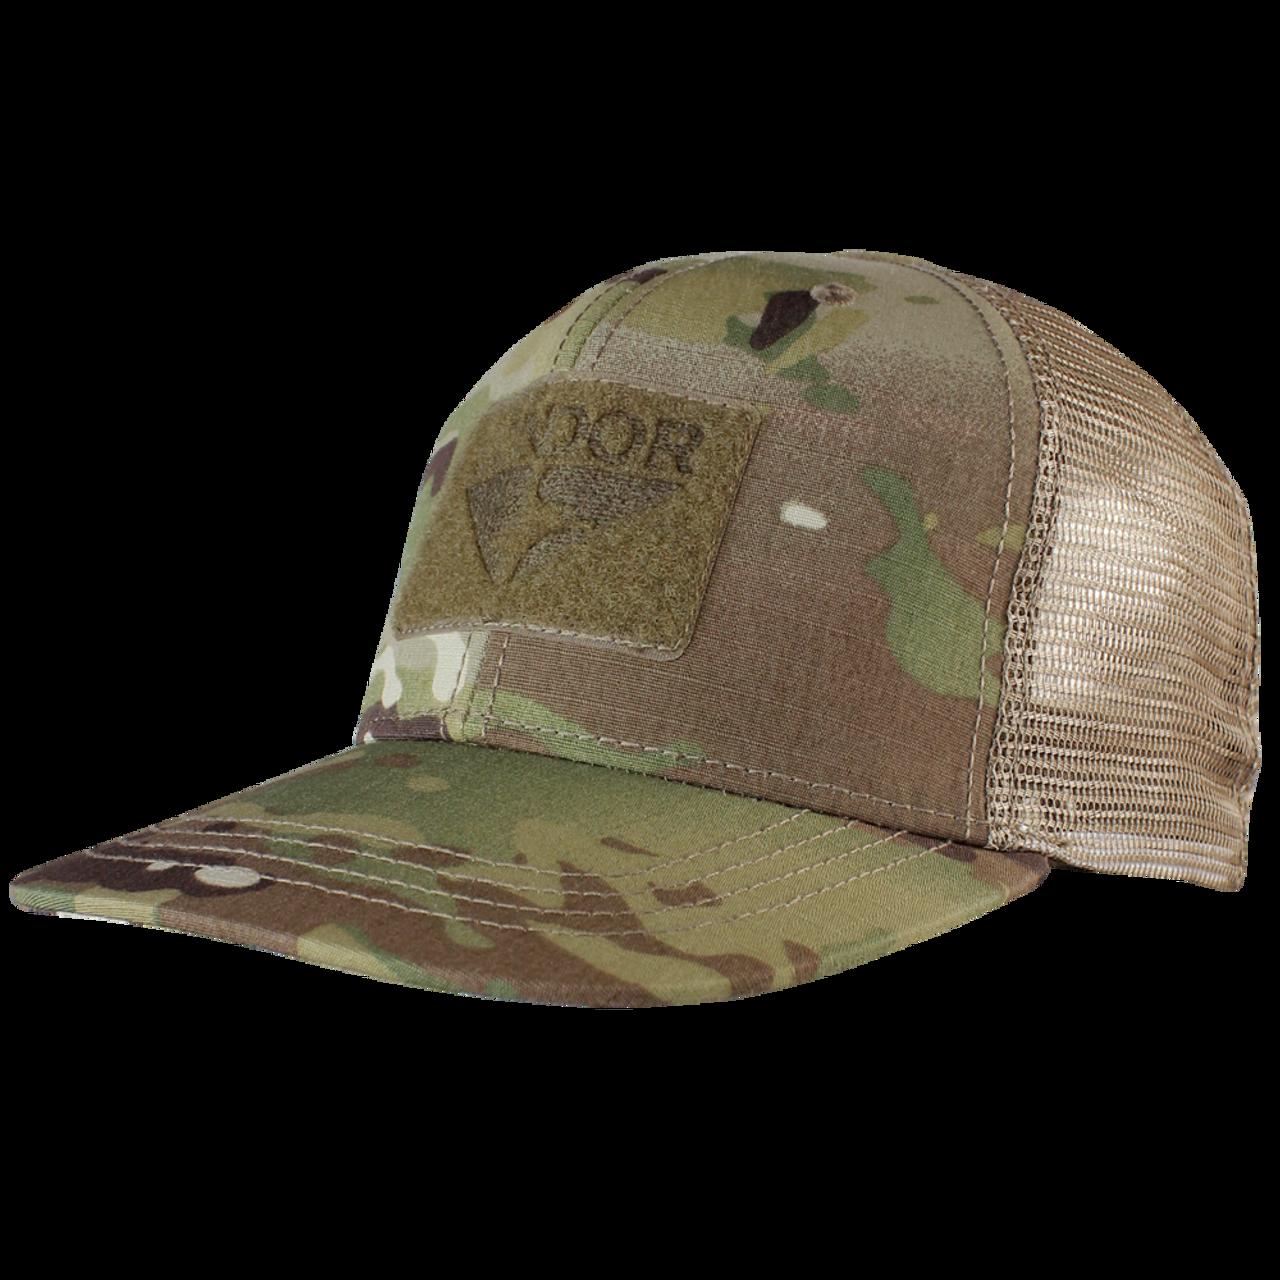 5056ae0ce7b84 Condor Flat Bill Trucker Hat with MultiCam - Hero Outdoors